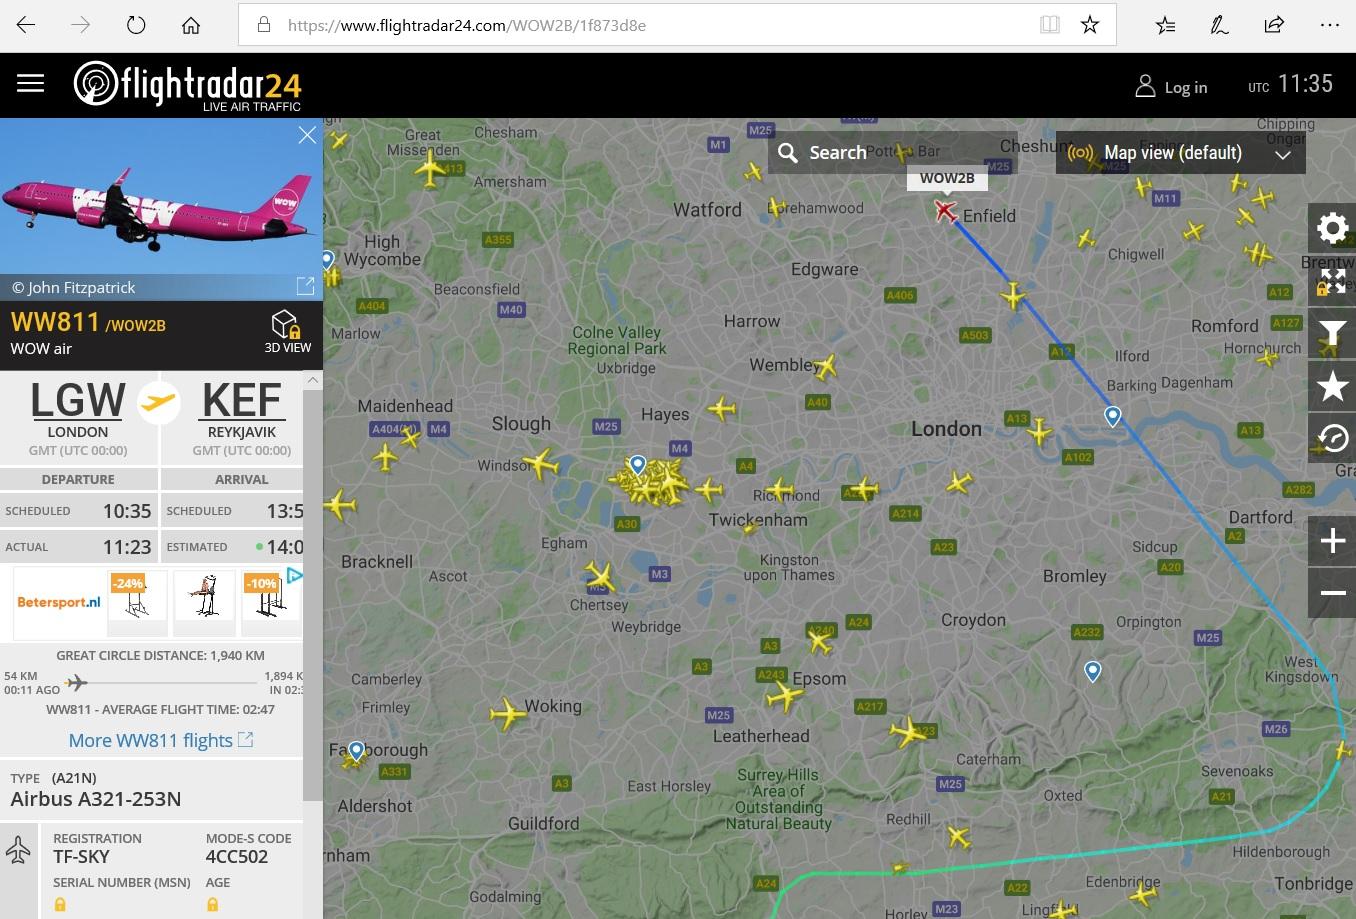 Flightradar24 — how it works? - 1